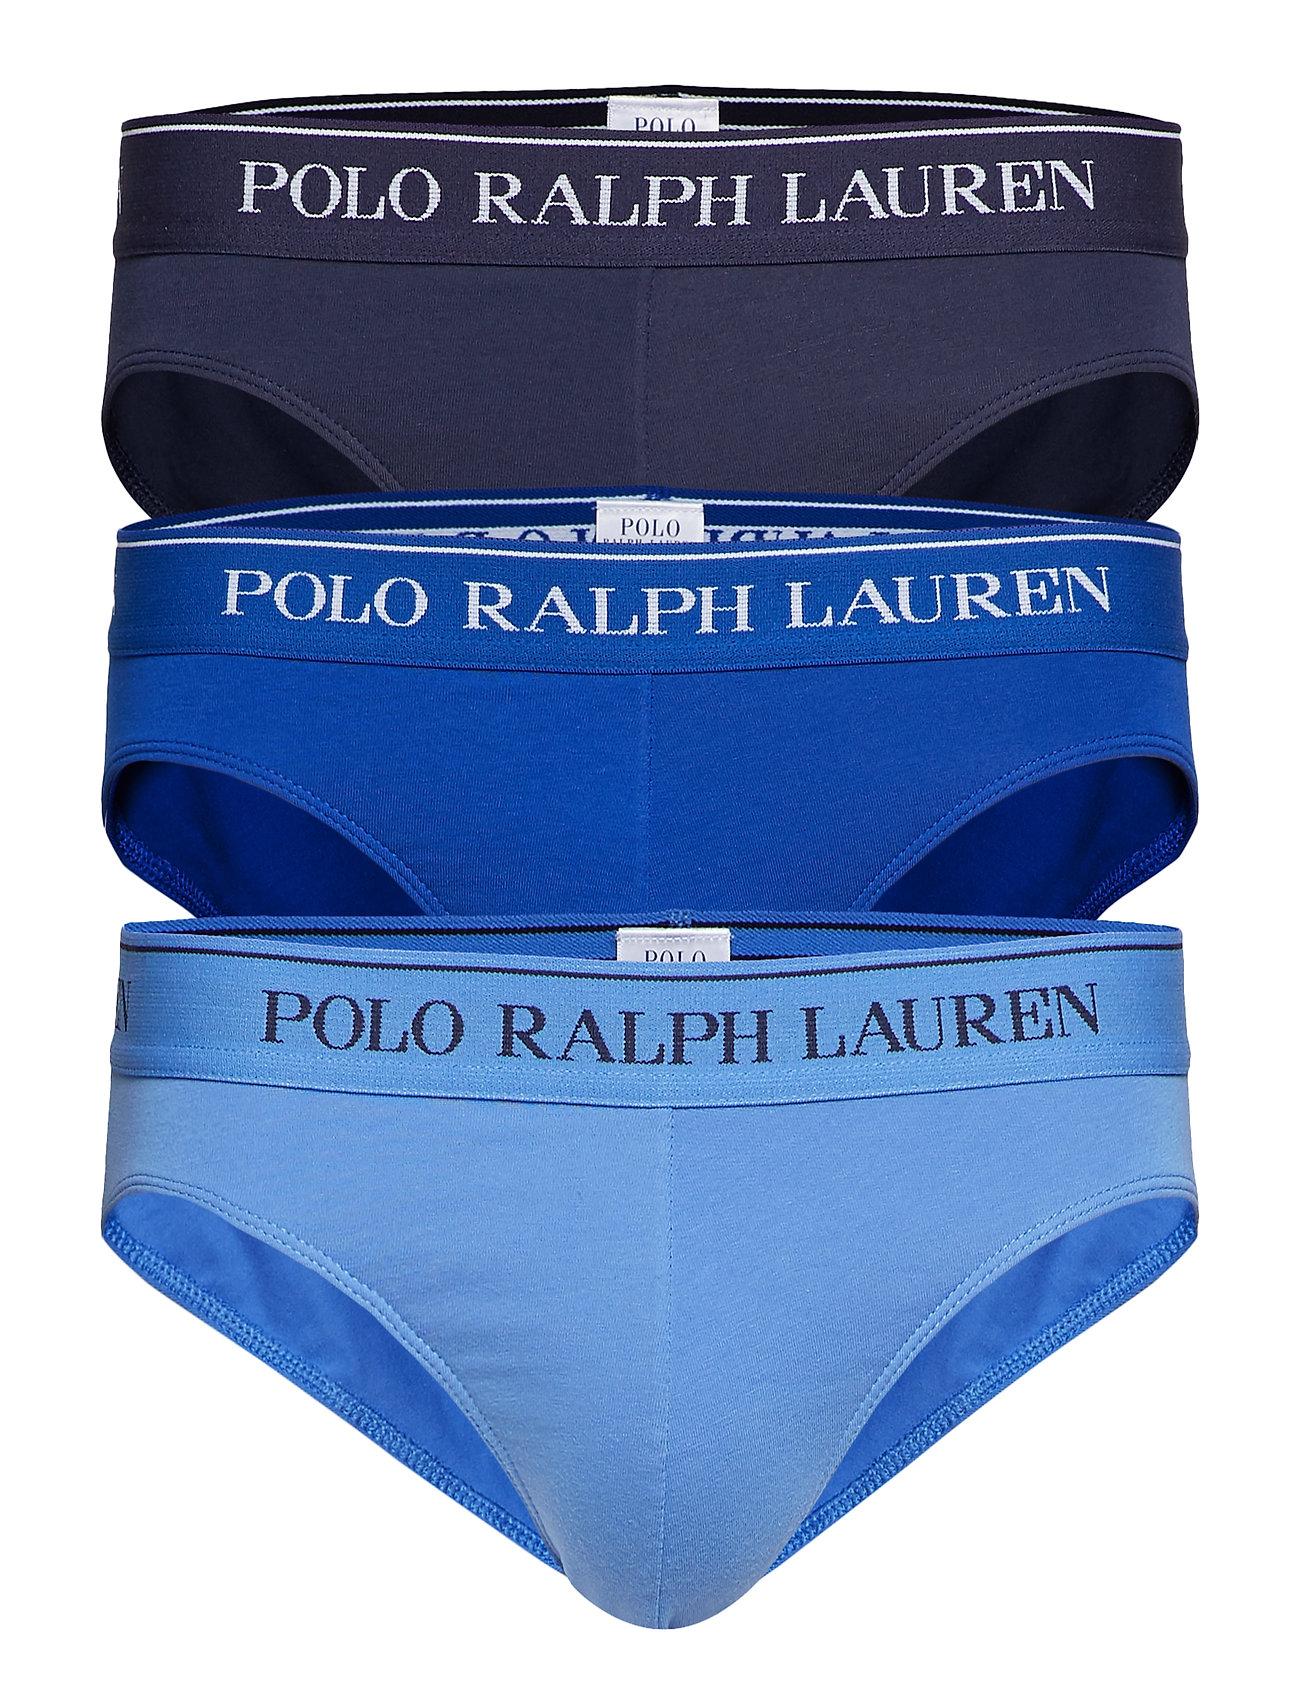 Polo Ralph Lauren Underwear 3 PACK LOW RISE BRIEFS - CR NVY/SAPHIR STA